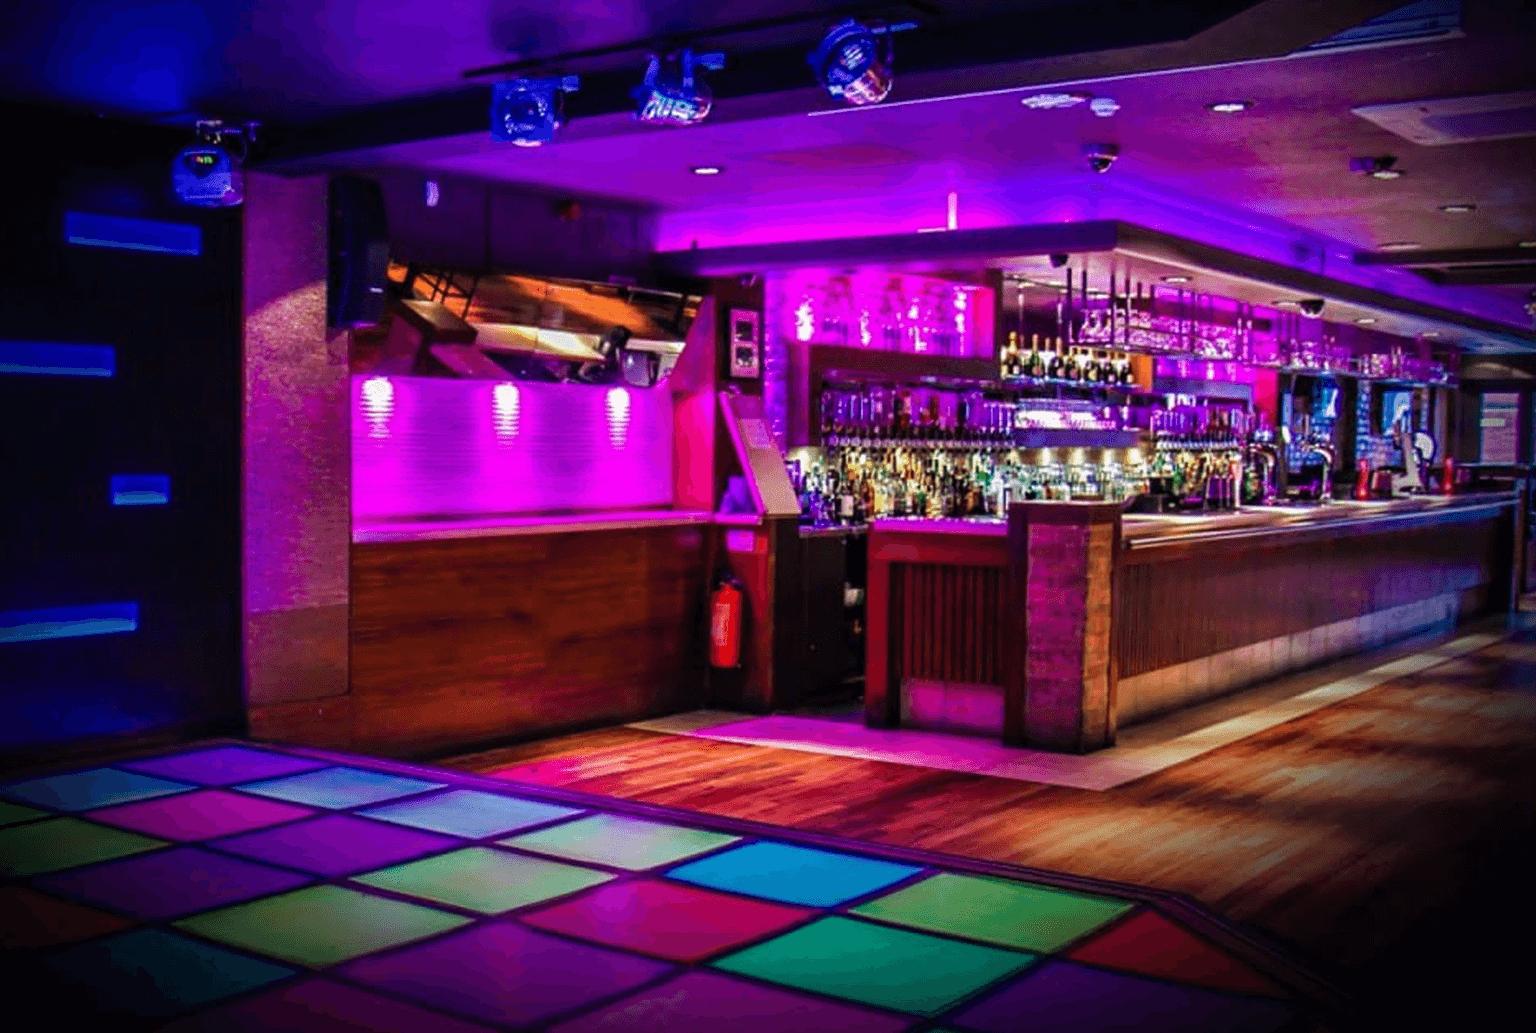 night club dance floor lighting and sound system installation